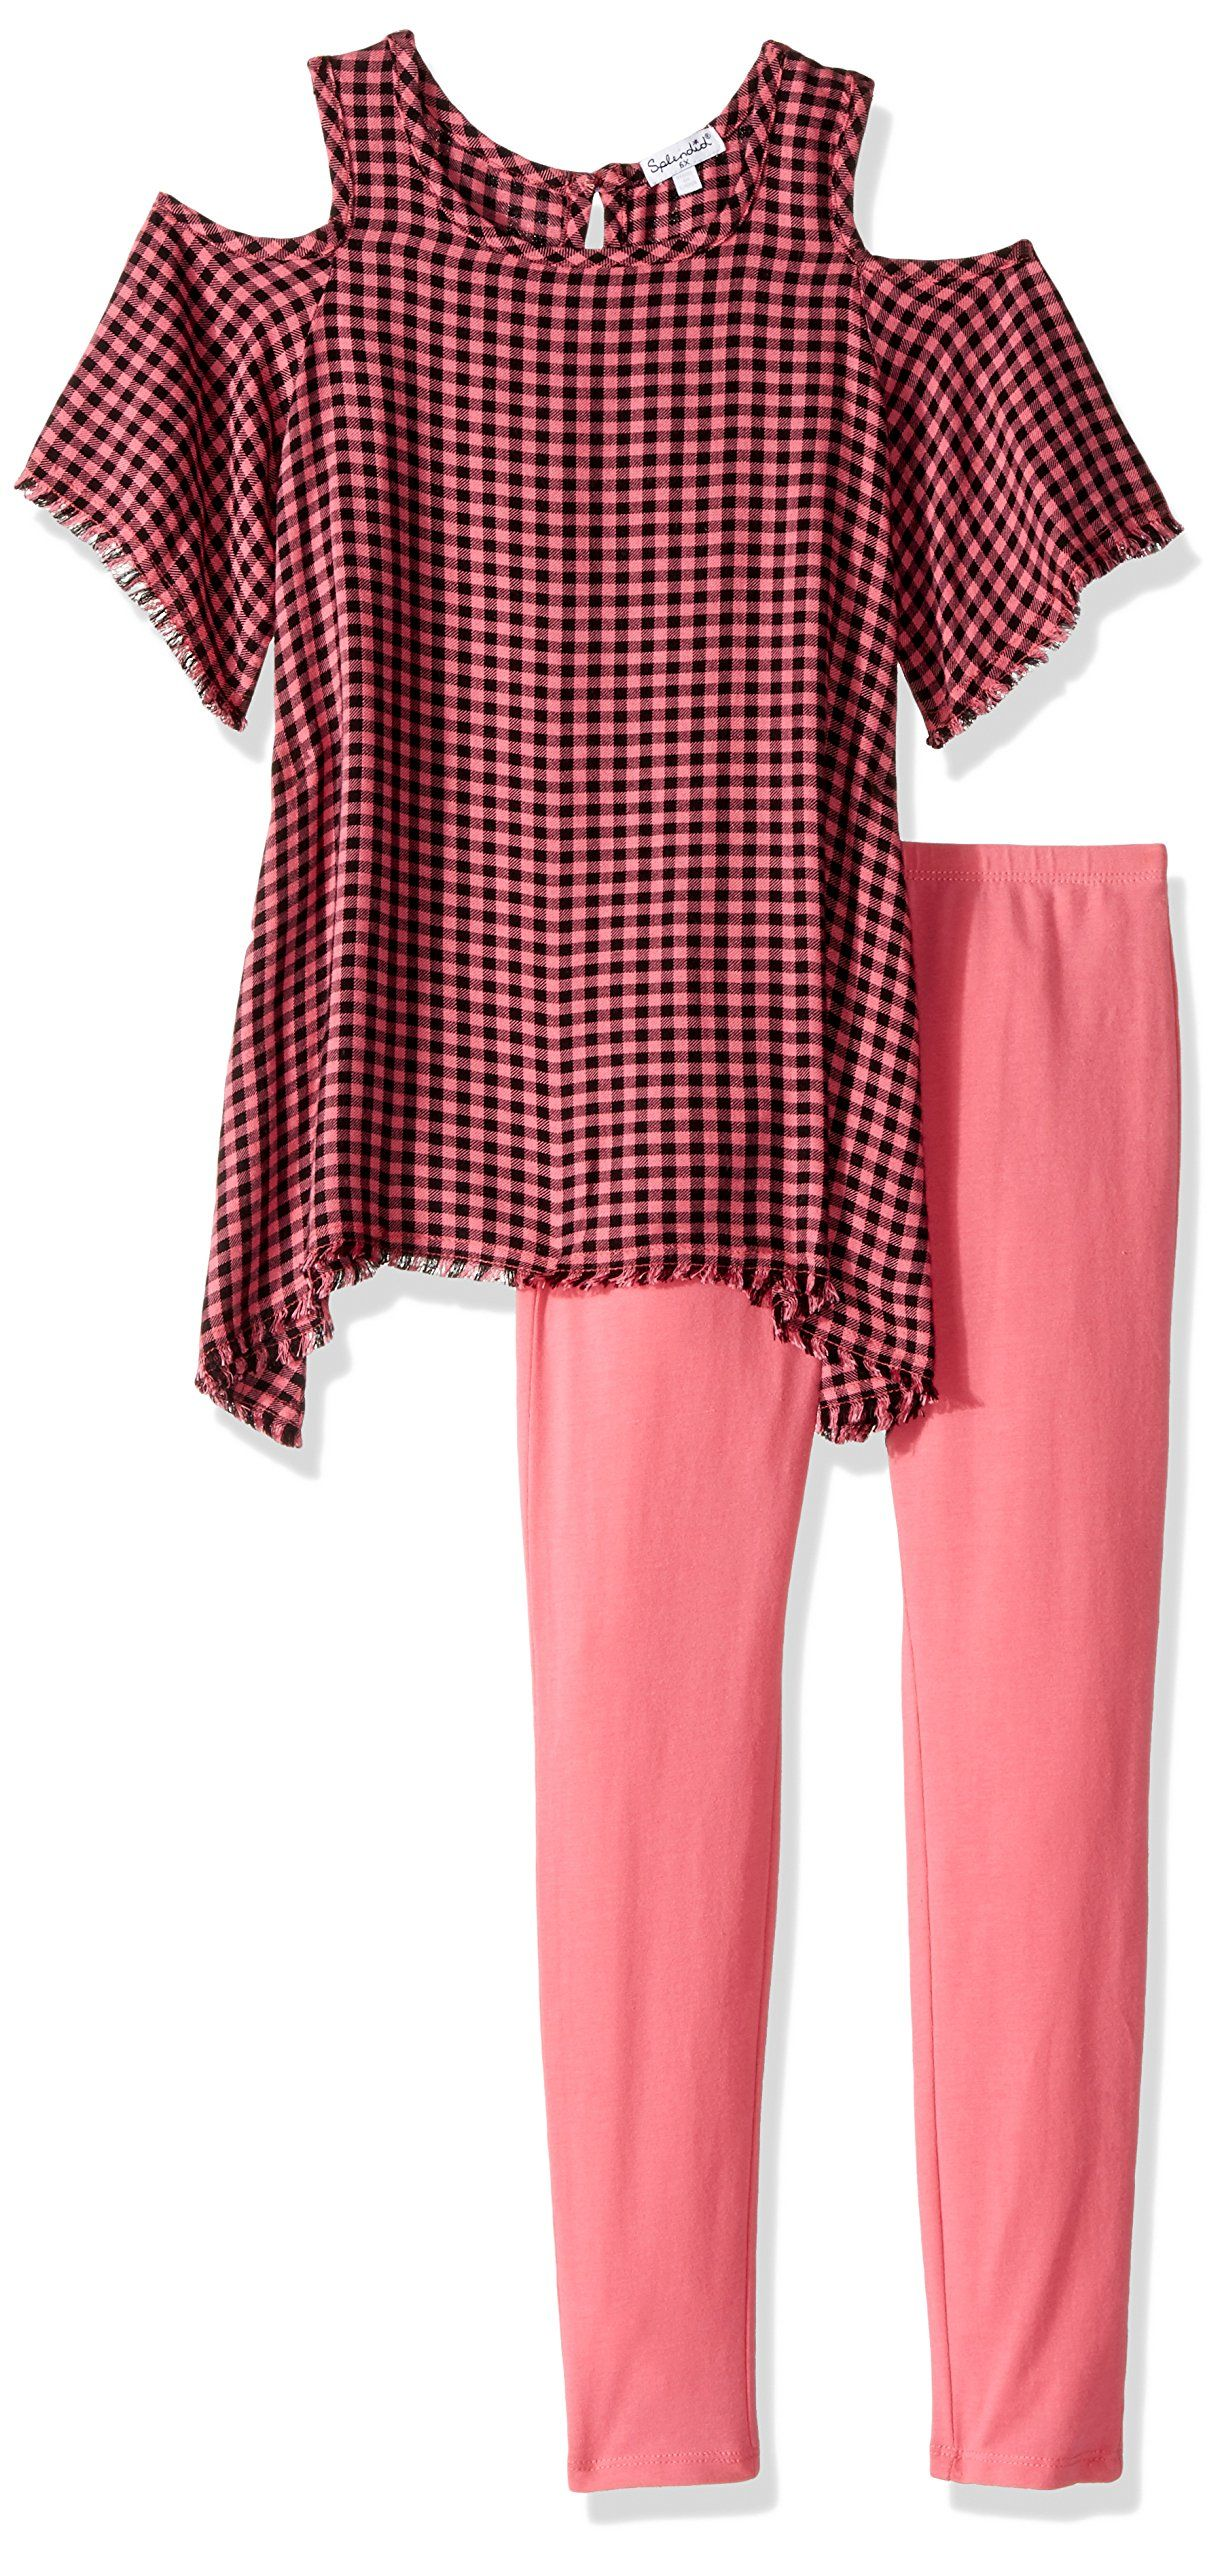 Splendid little girlsu yarn dyed plaid cold shoulder top set check